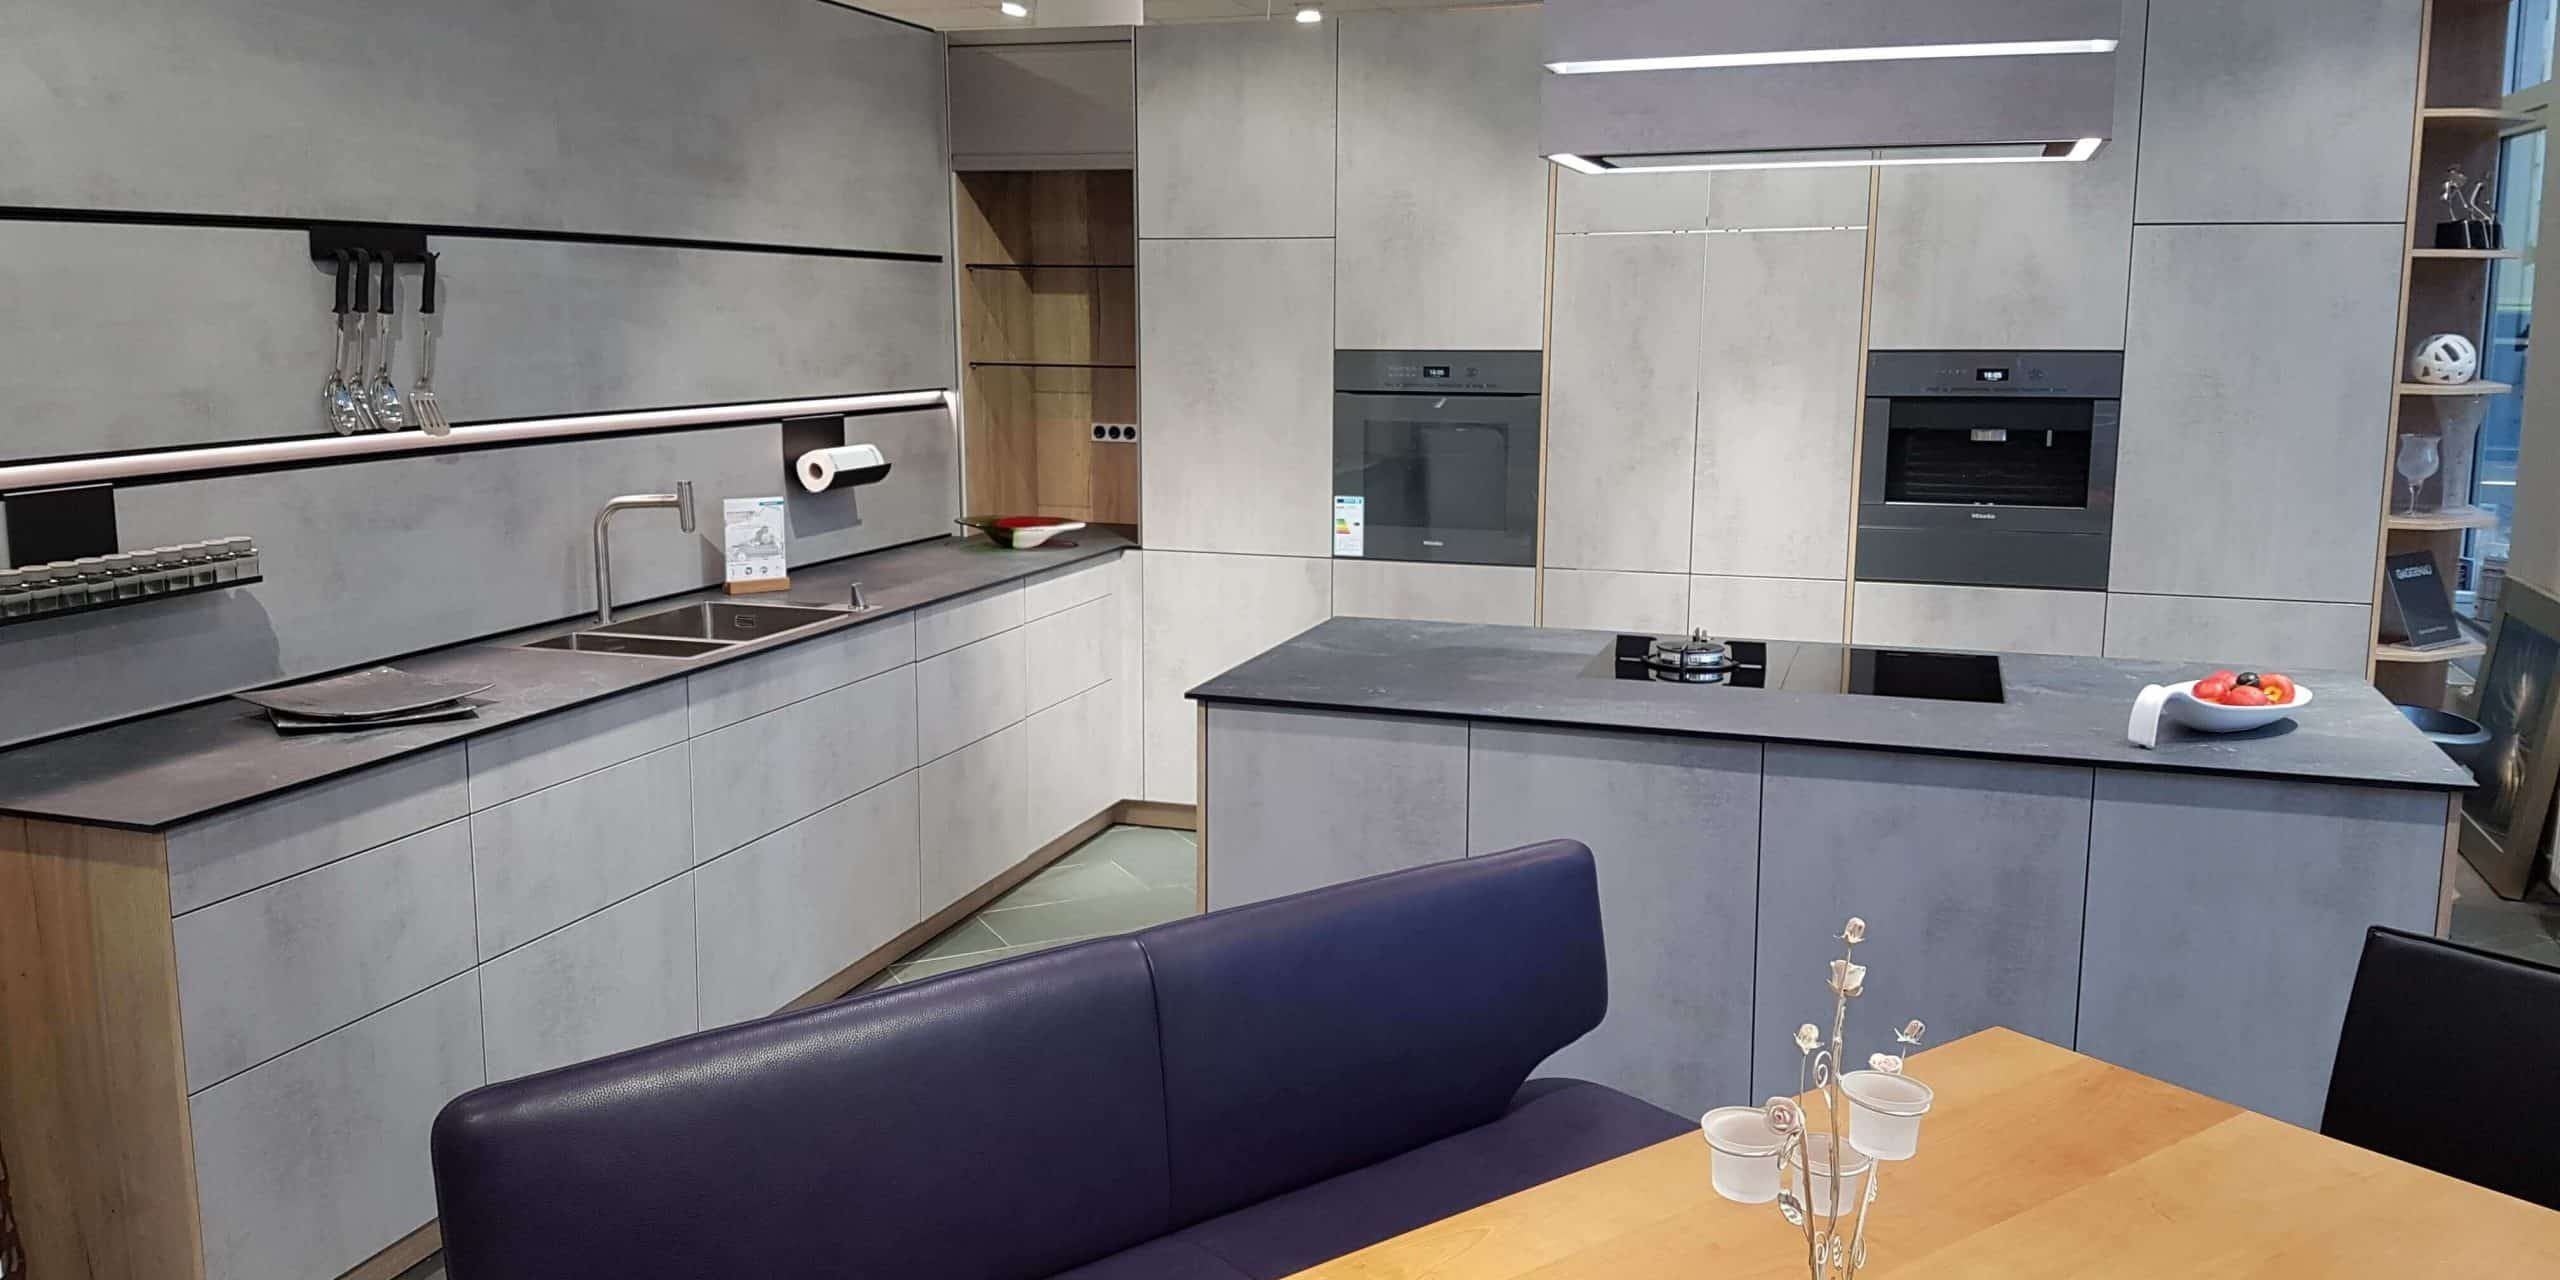 Full Size of Neu Bei Uns Im Showroom Schller Modell Elba Beton Quarzgrau Küchen Regal Wohnzimmer Küchen Aktuell